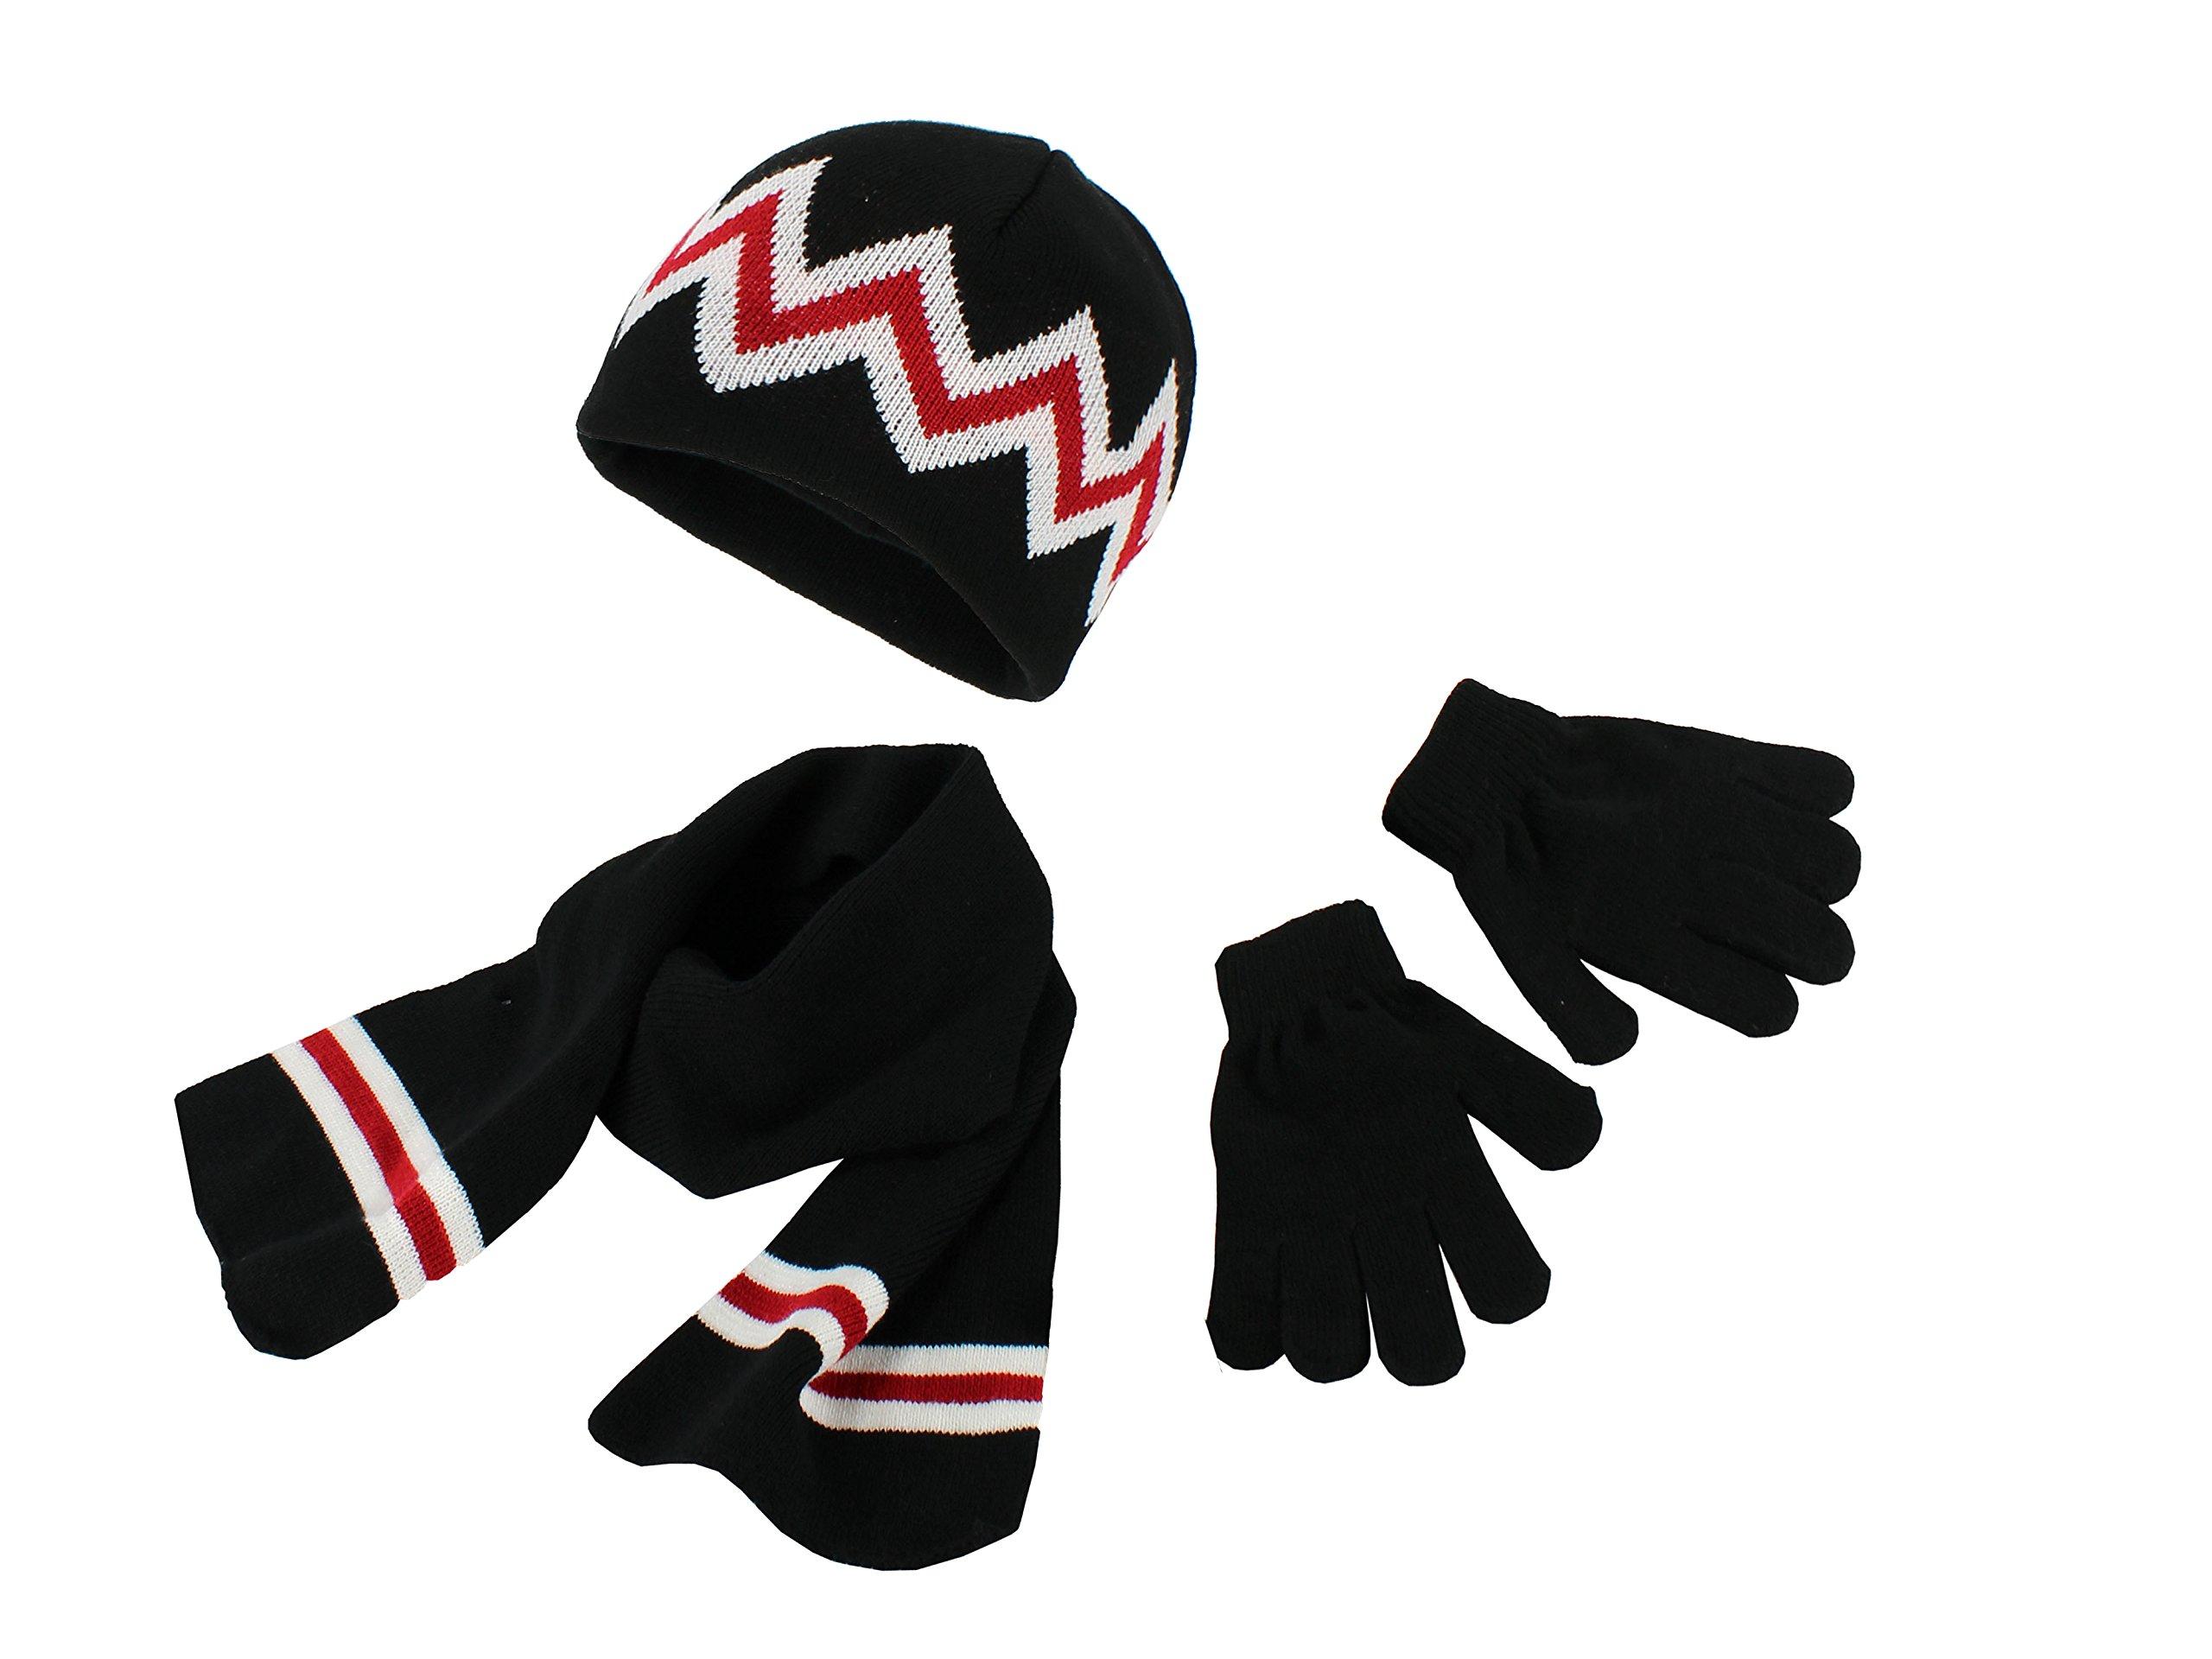 Polar Wear Boys Knit Hat, Scarf And Gloves Set - Black/Red by Polar Wear (Image #1)